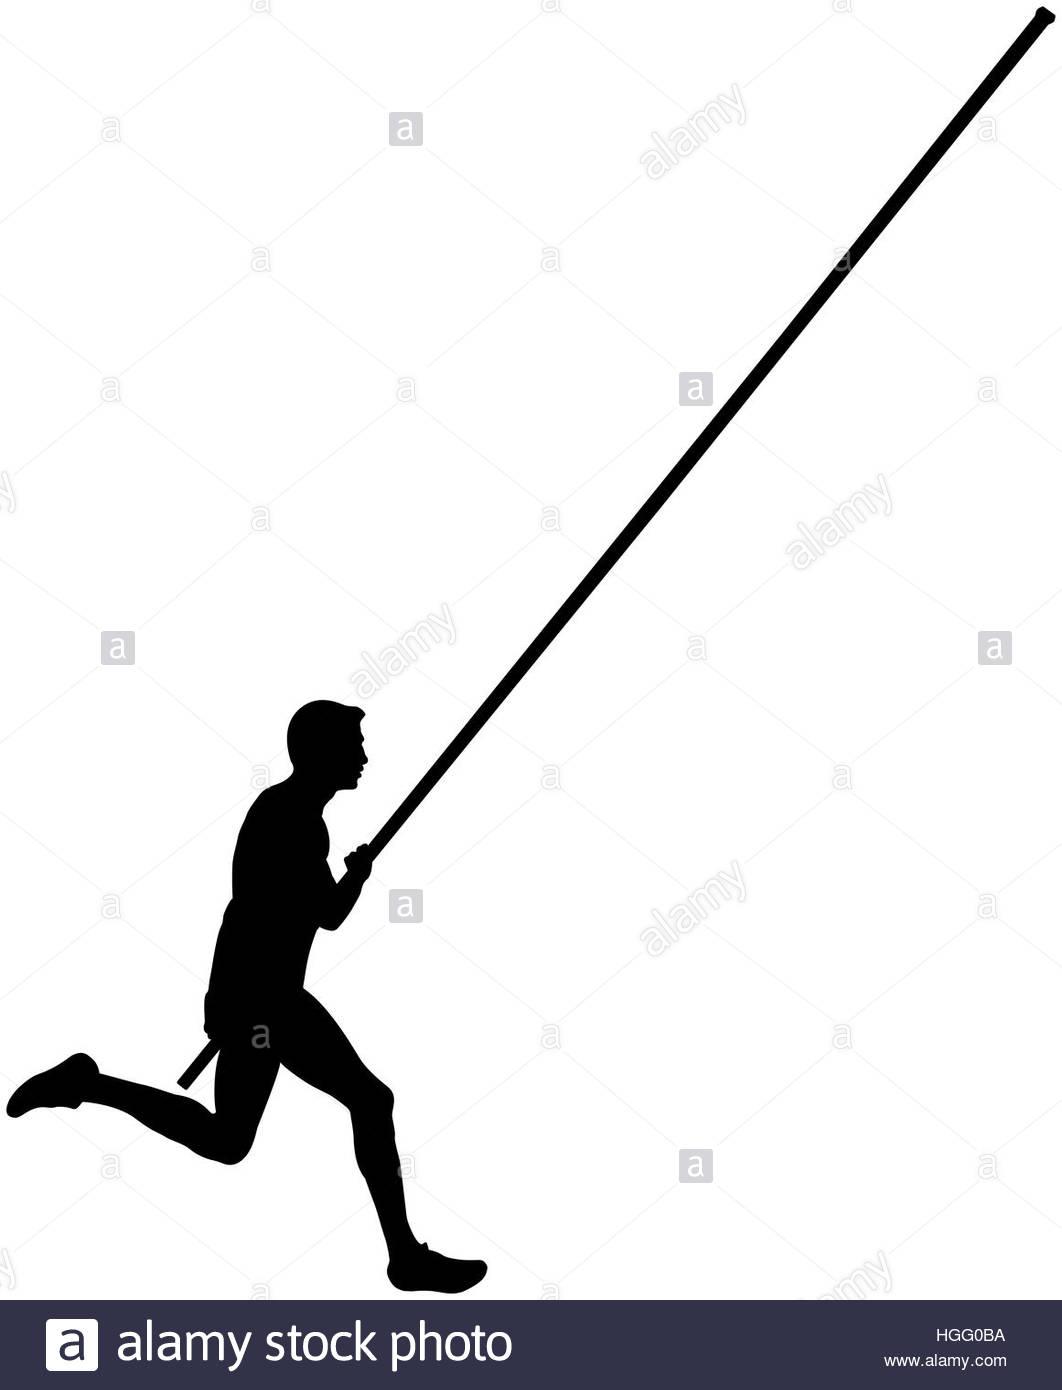 1062x1390 Black Silhouette Running Athlete Male Pole Vault Stock Photo